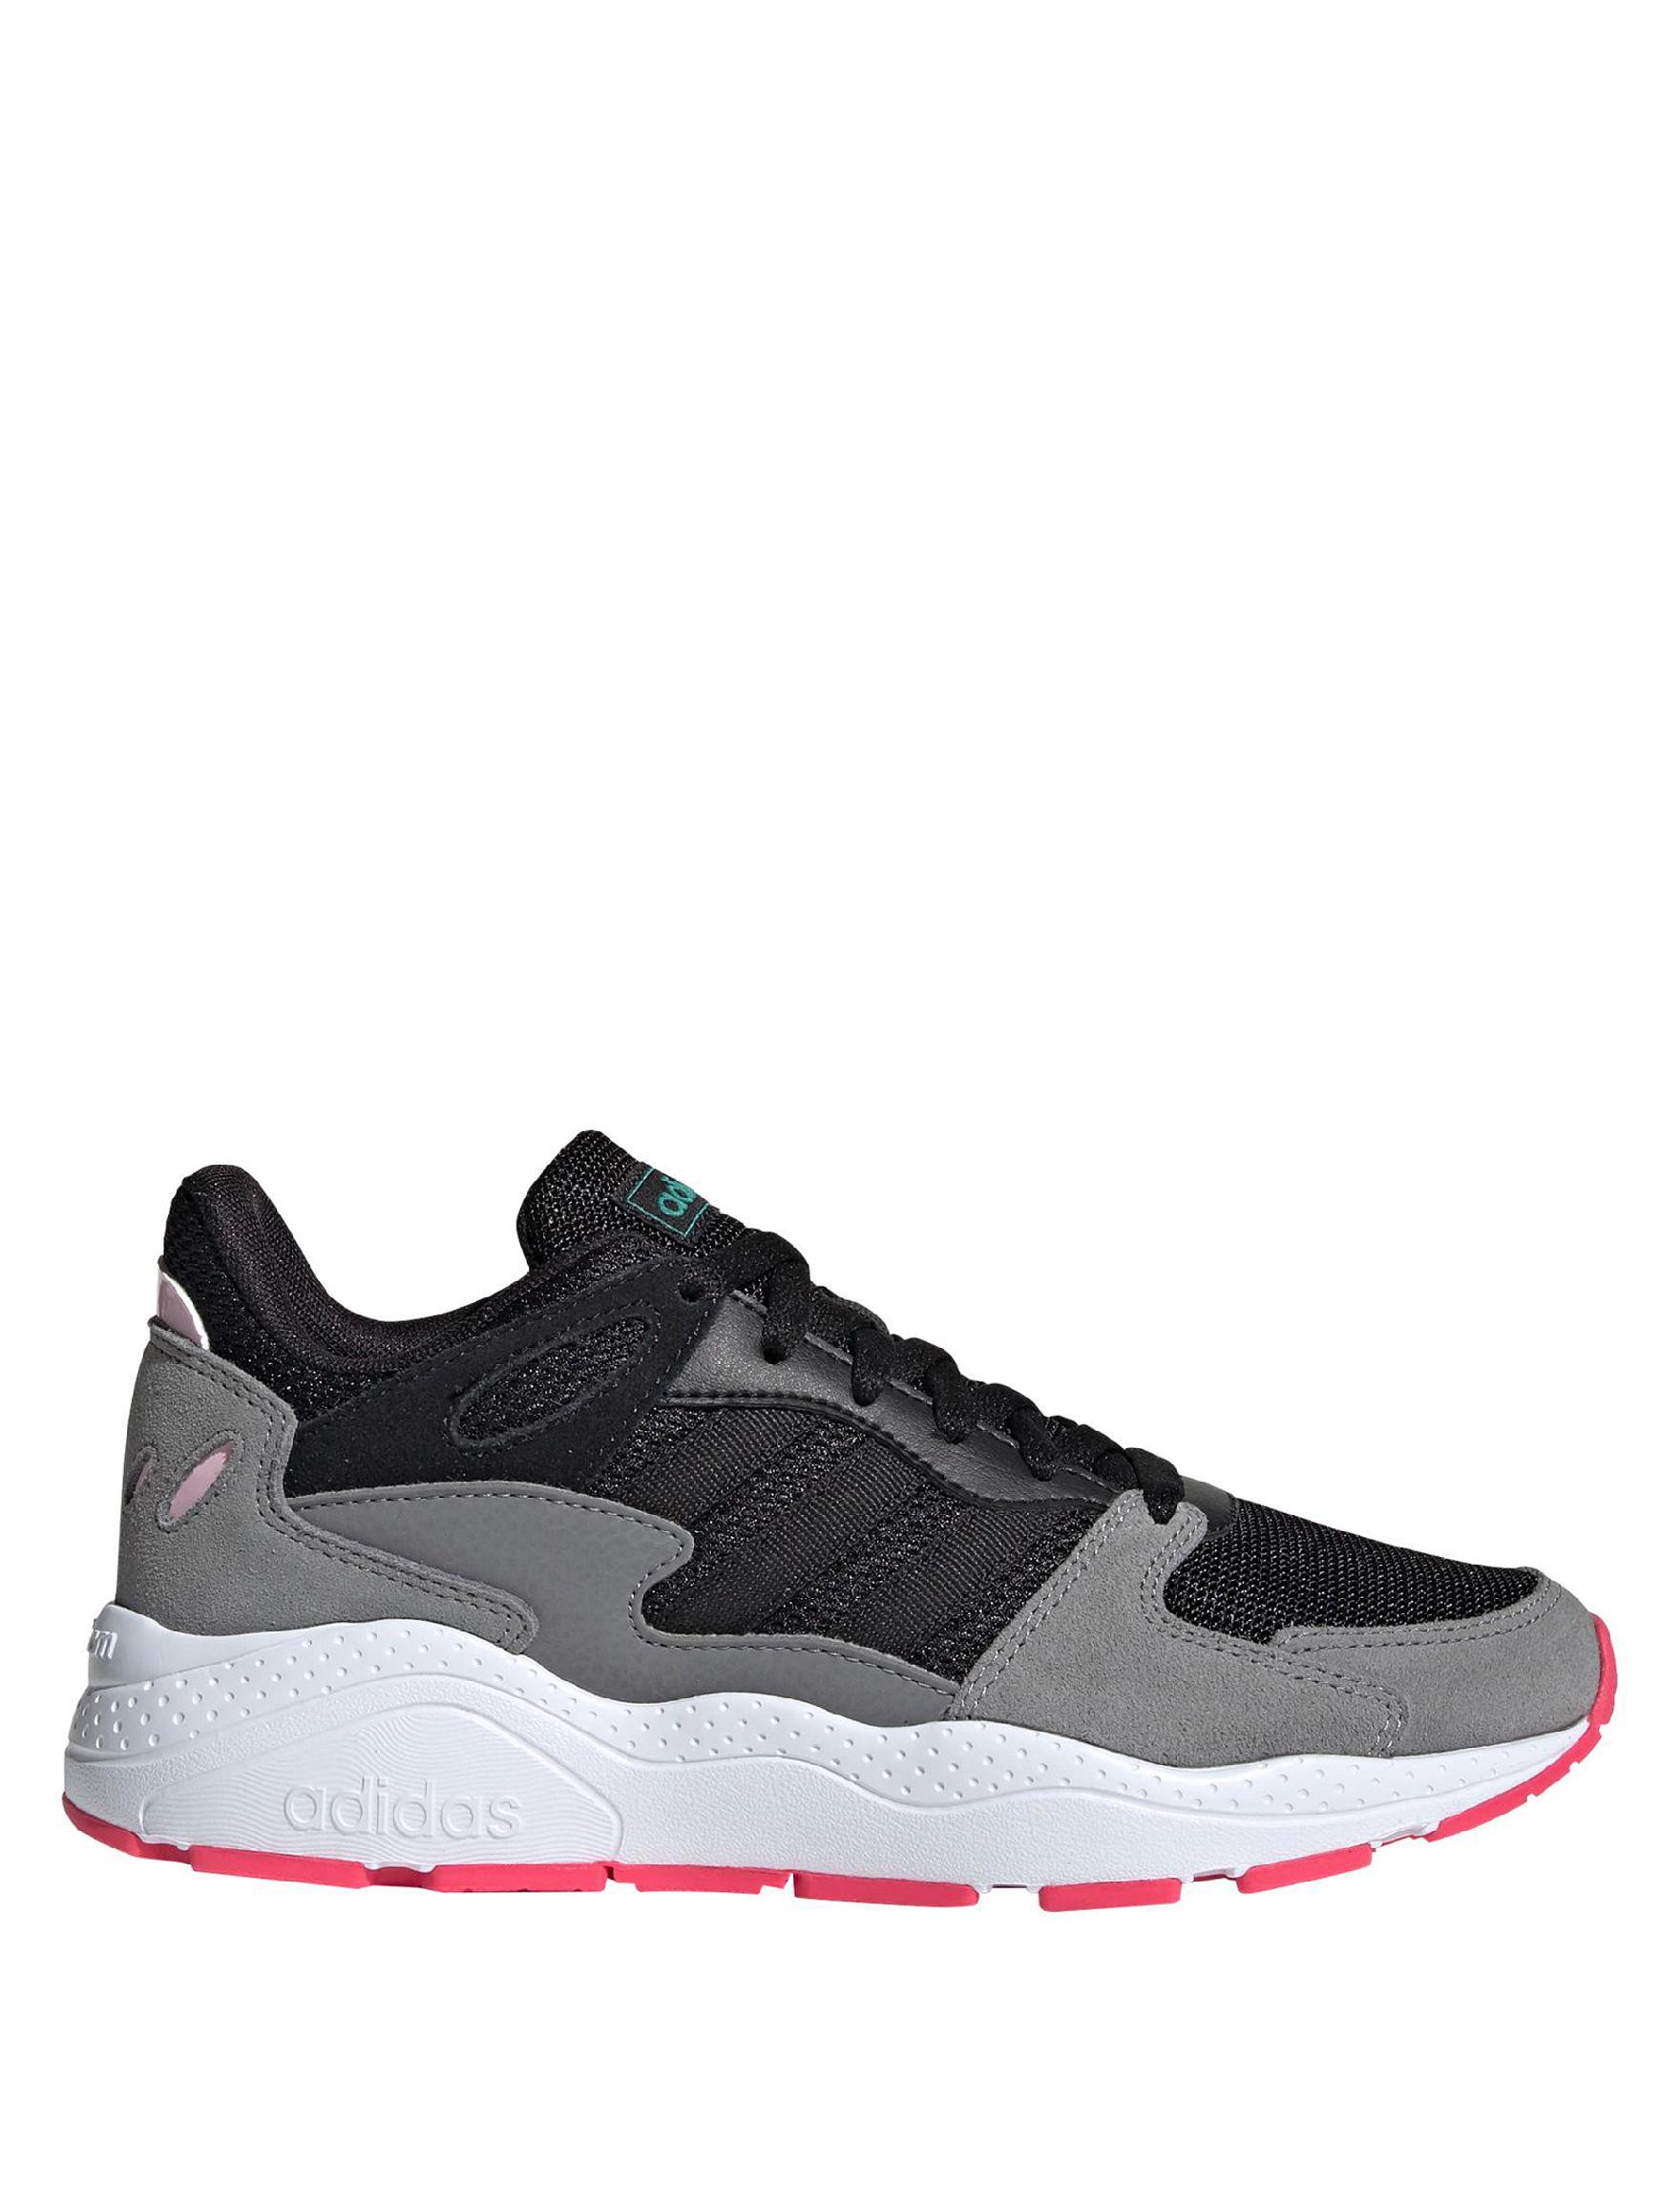 Adidas Black / Grey / White / Pink Comfort Shoes